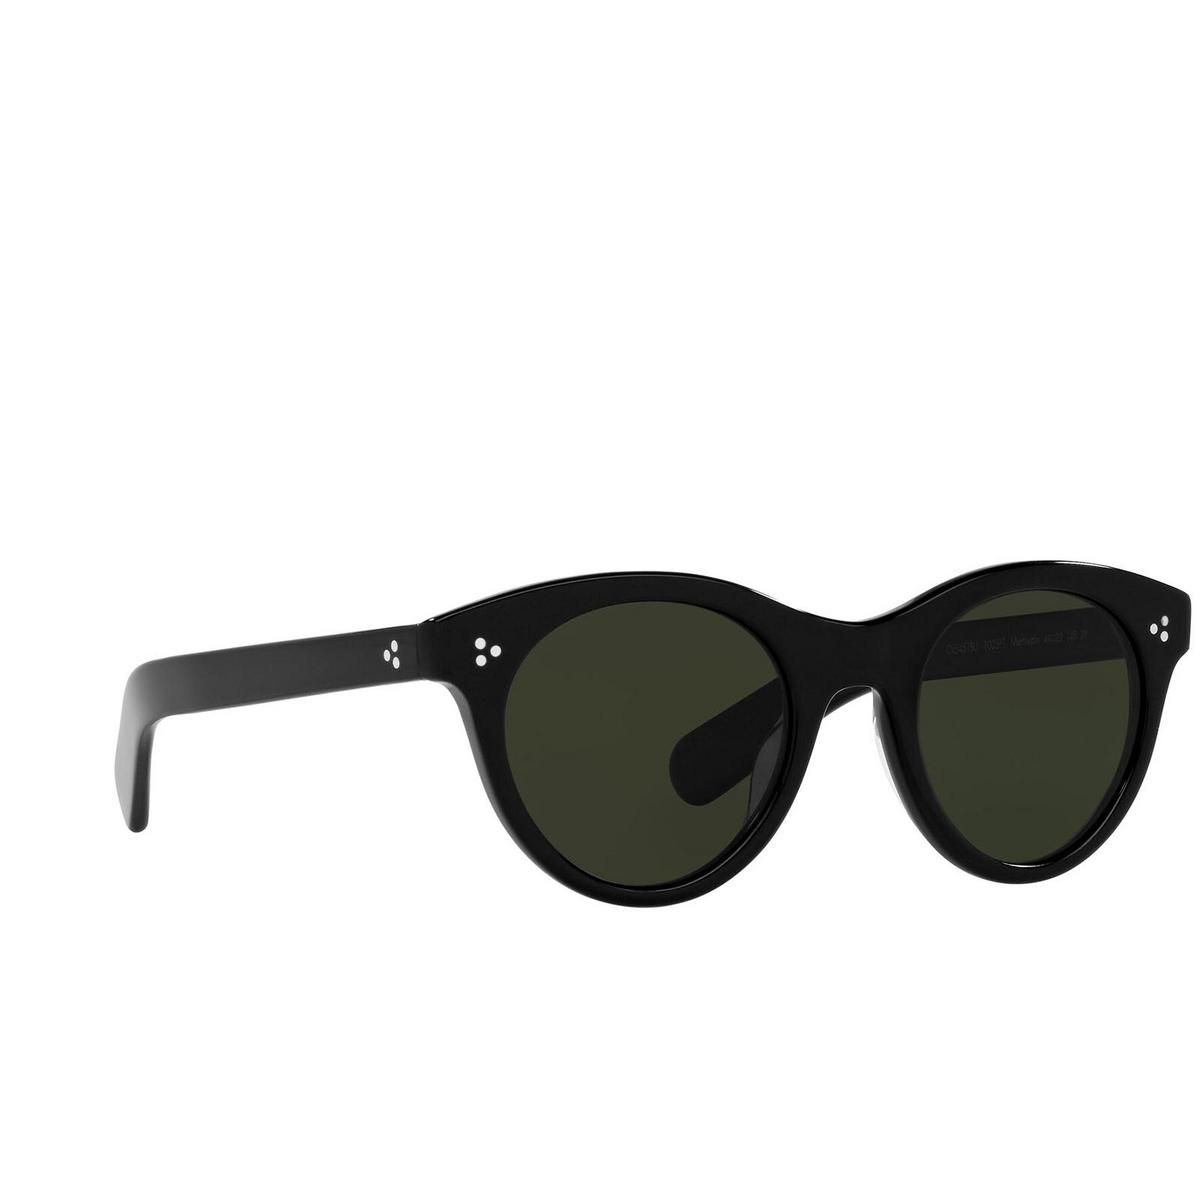 Oliver Peoples® Round Sunglasses: Merrivale OV5451SU color Black 1005P1 - three-quarters view.